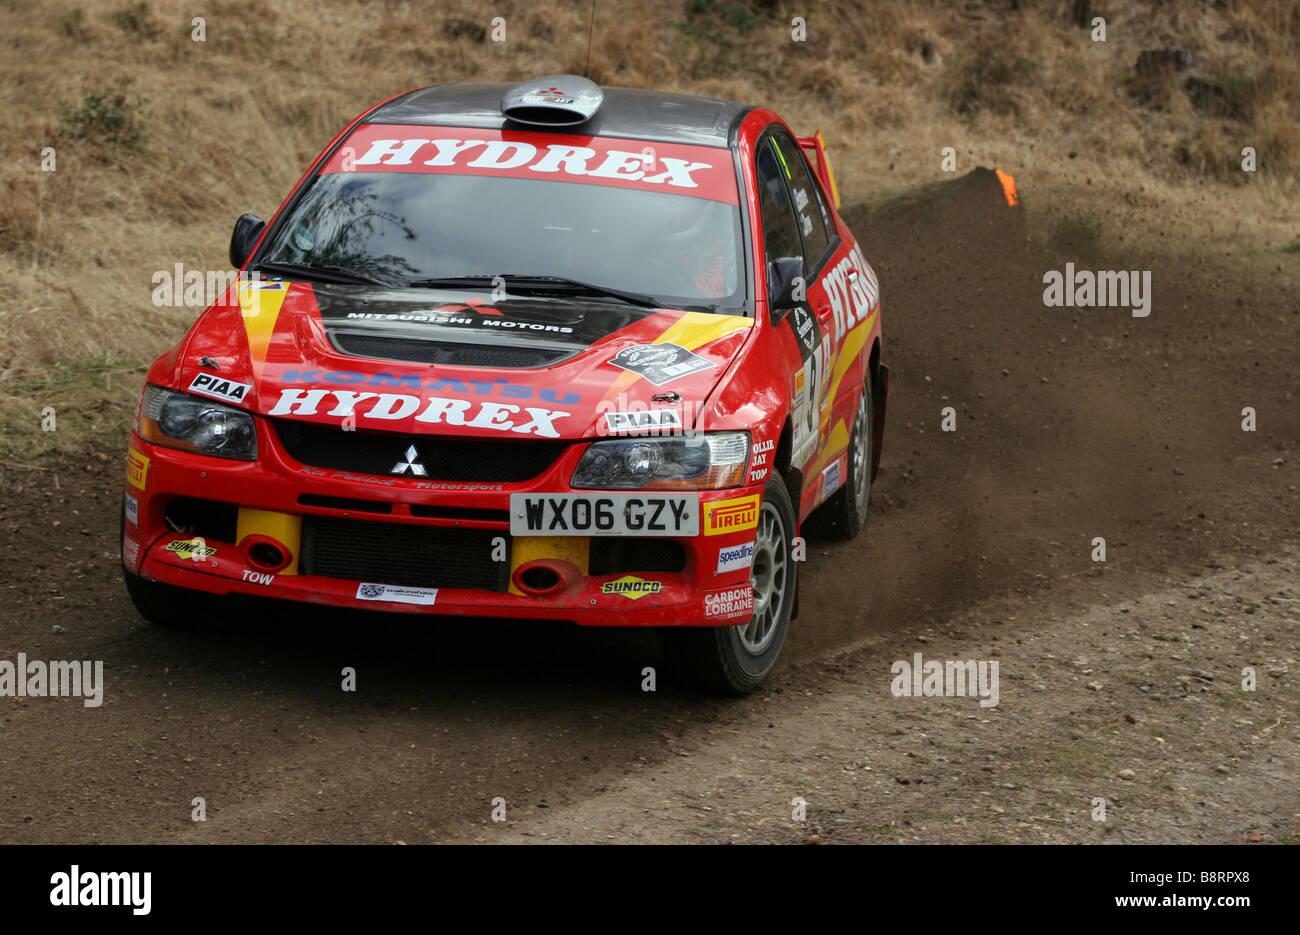 Azione girato di rally car proforming al Rallye Sunseeker 2009 Immagini Stock